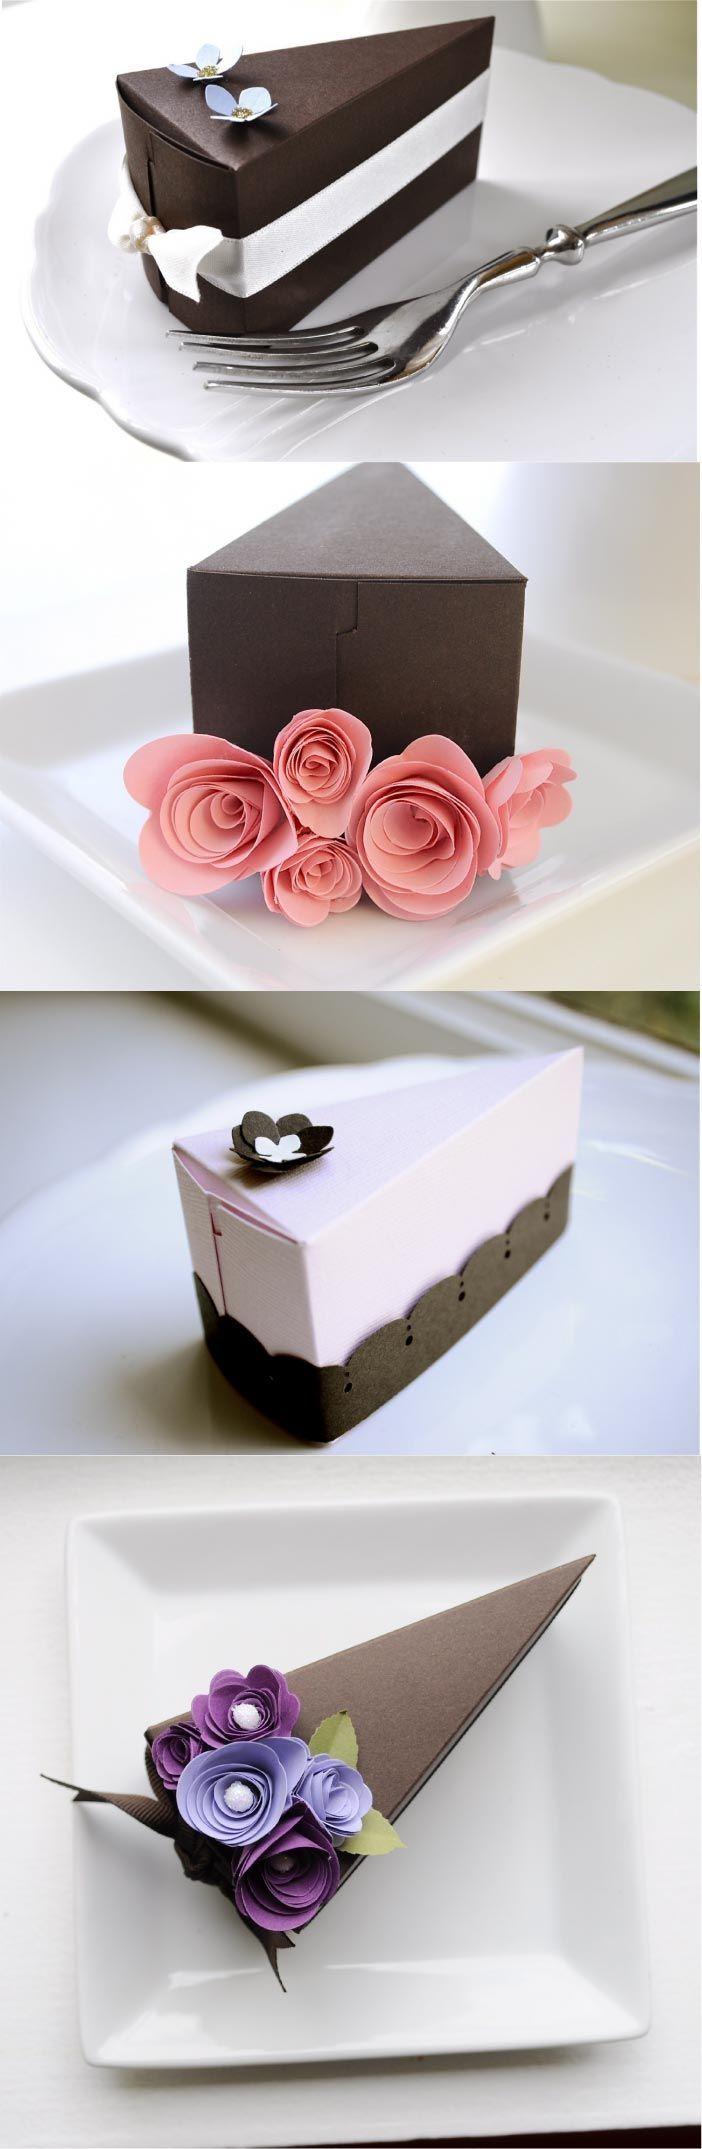 Paper cake favor slices | paper-cake-favors-by-Imeon-Design.jpg (702×2149)